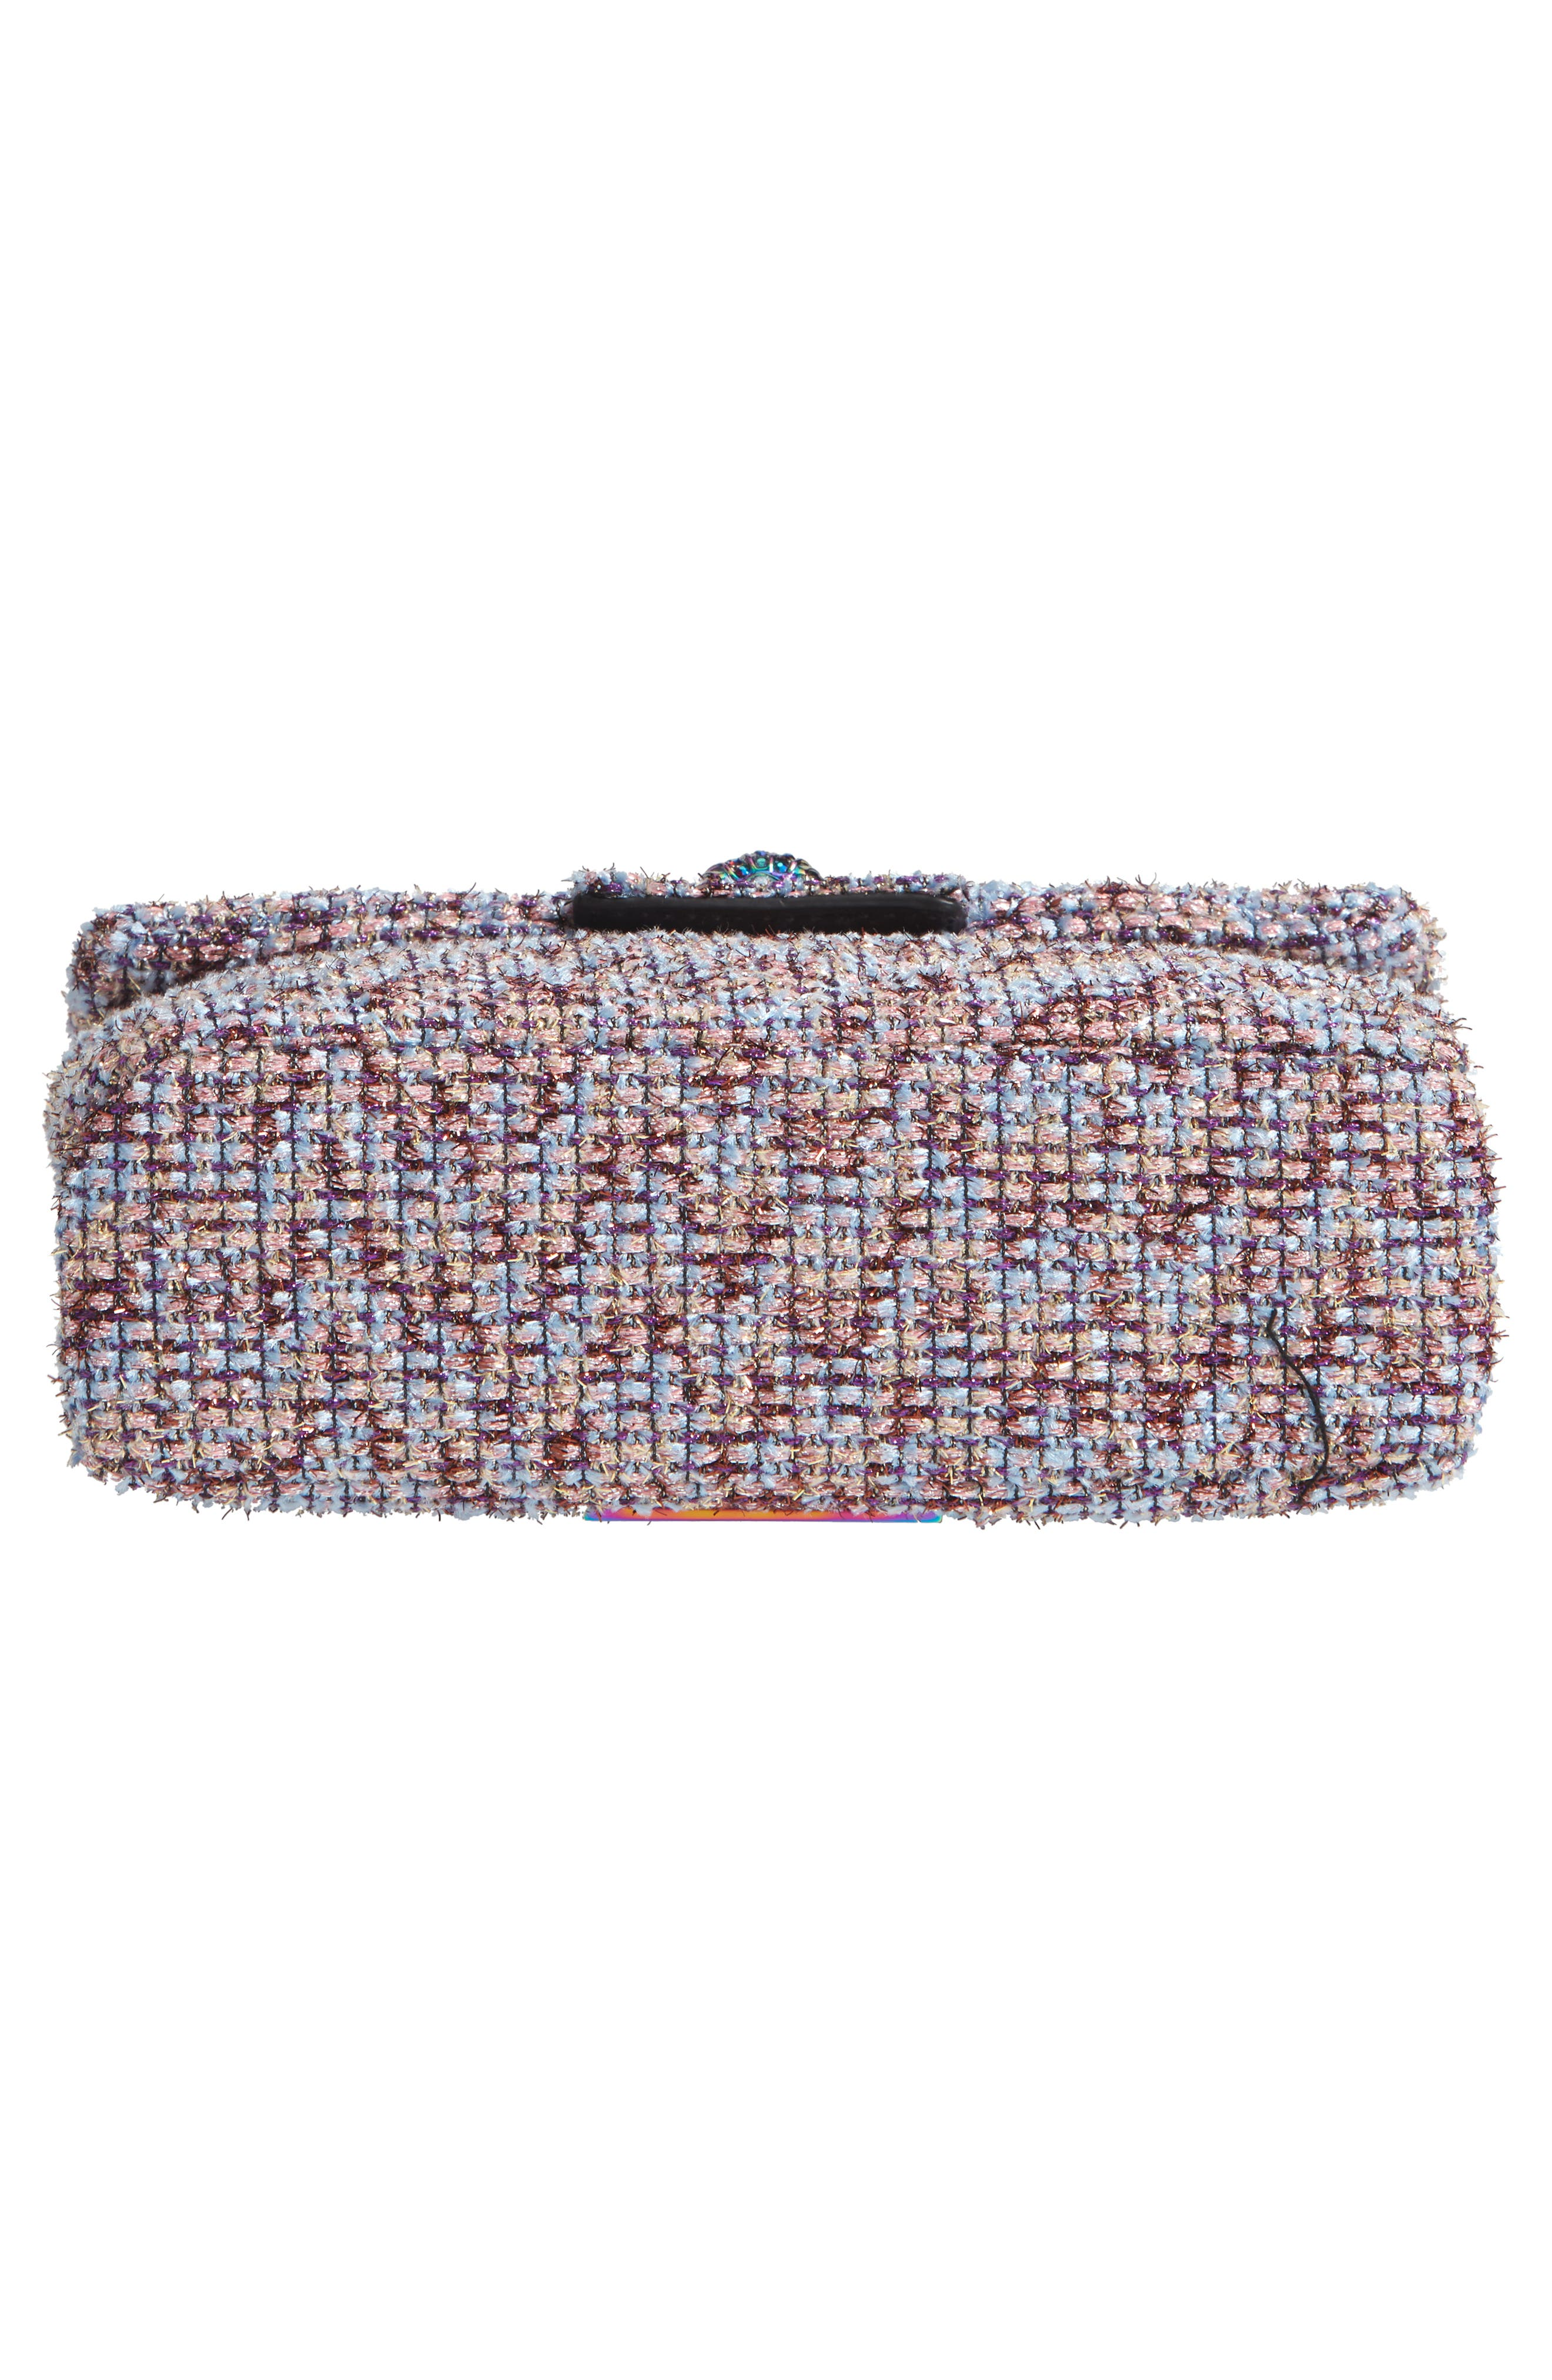 Mini Kensington Tweed Crossbody Bag,                             Alternate thumbnail 6, color,                             PINK